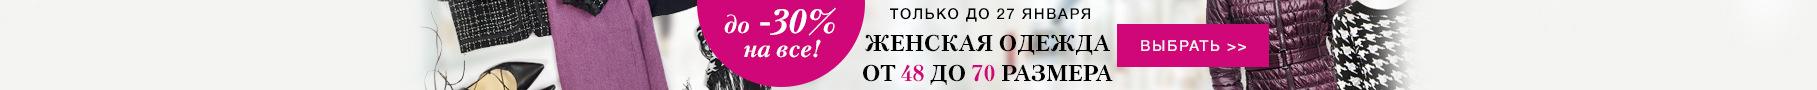 Скидки от 19% до 30% Женскую одежду от 48 до 70 размера